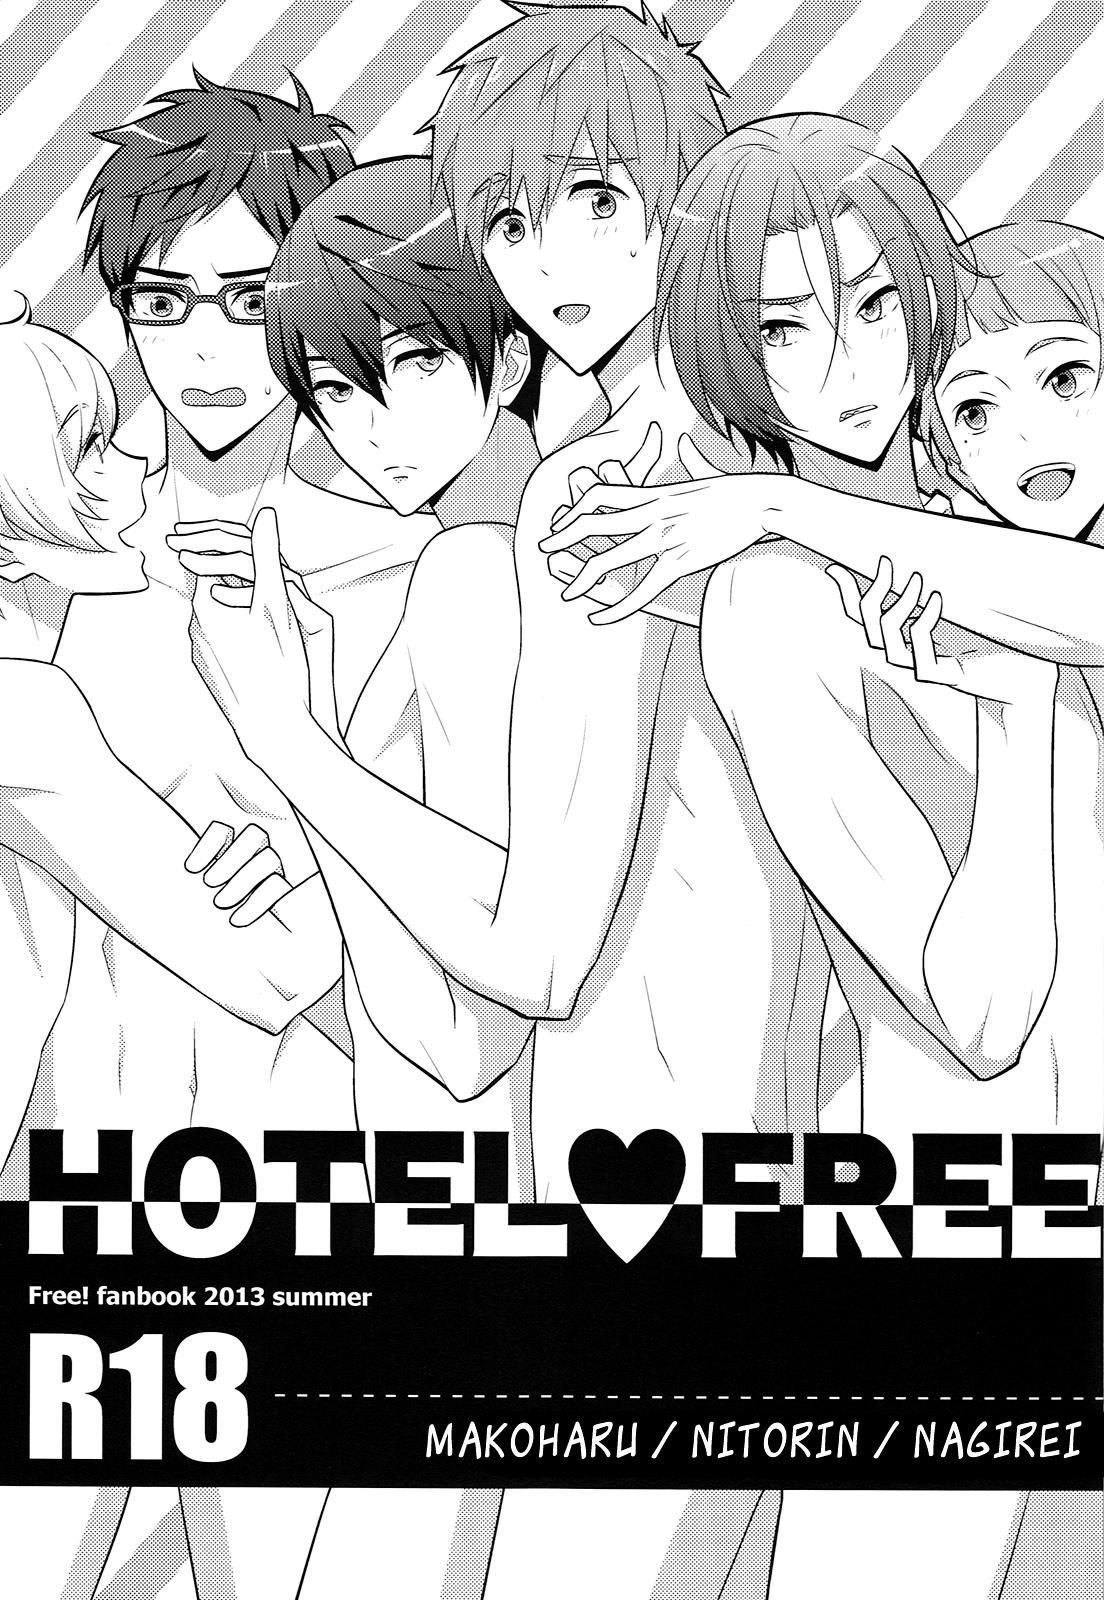 HOTEL FREE 1